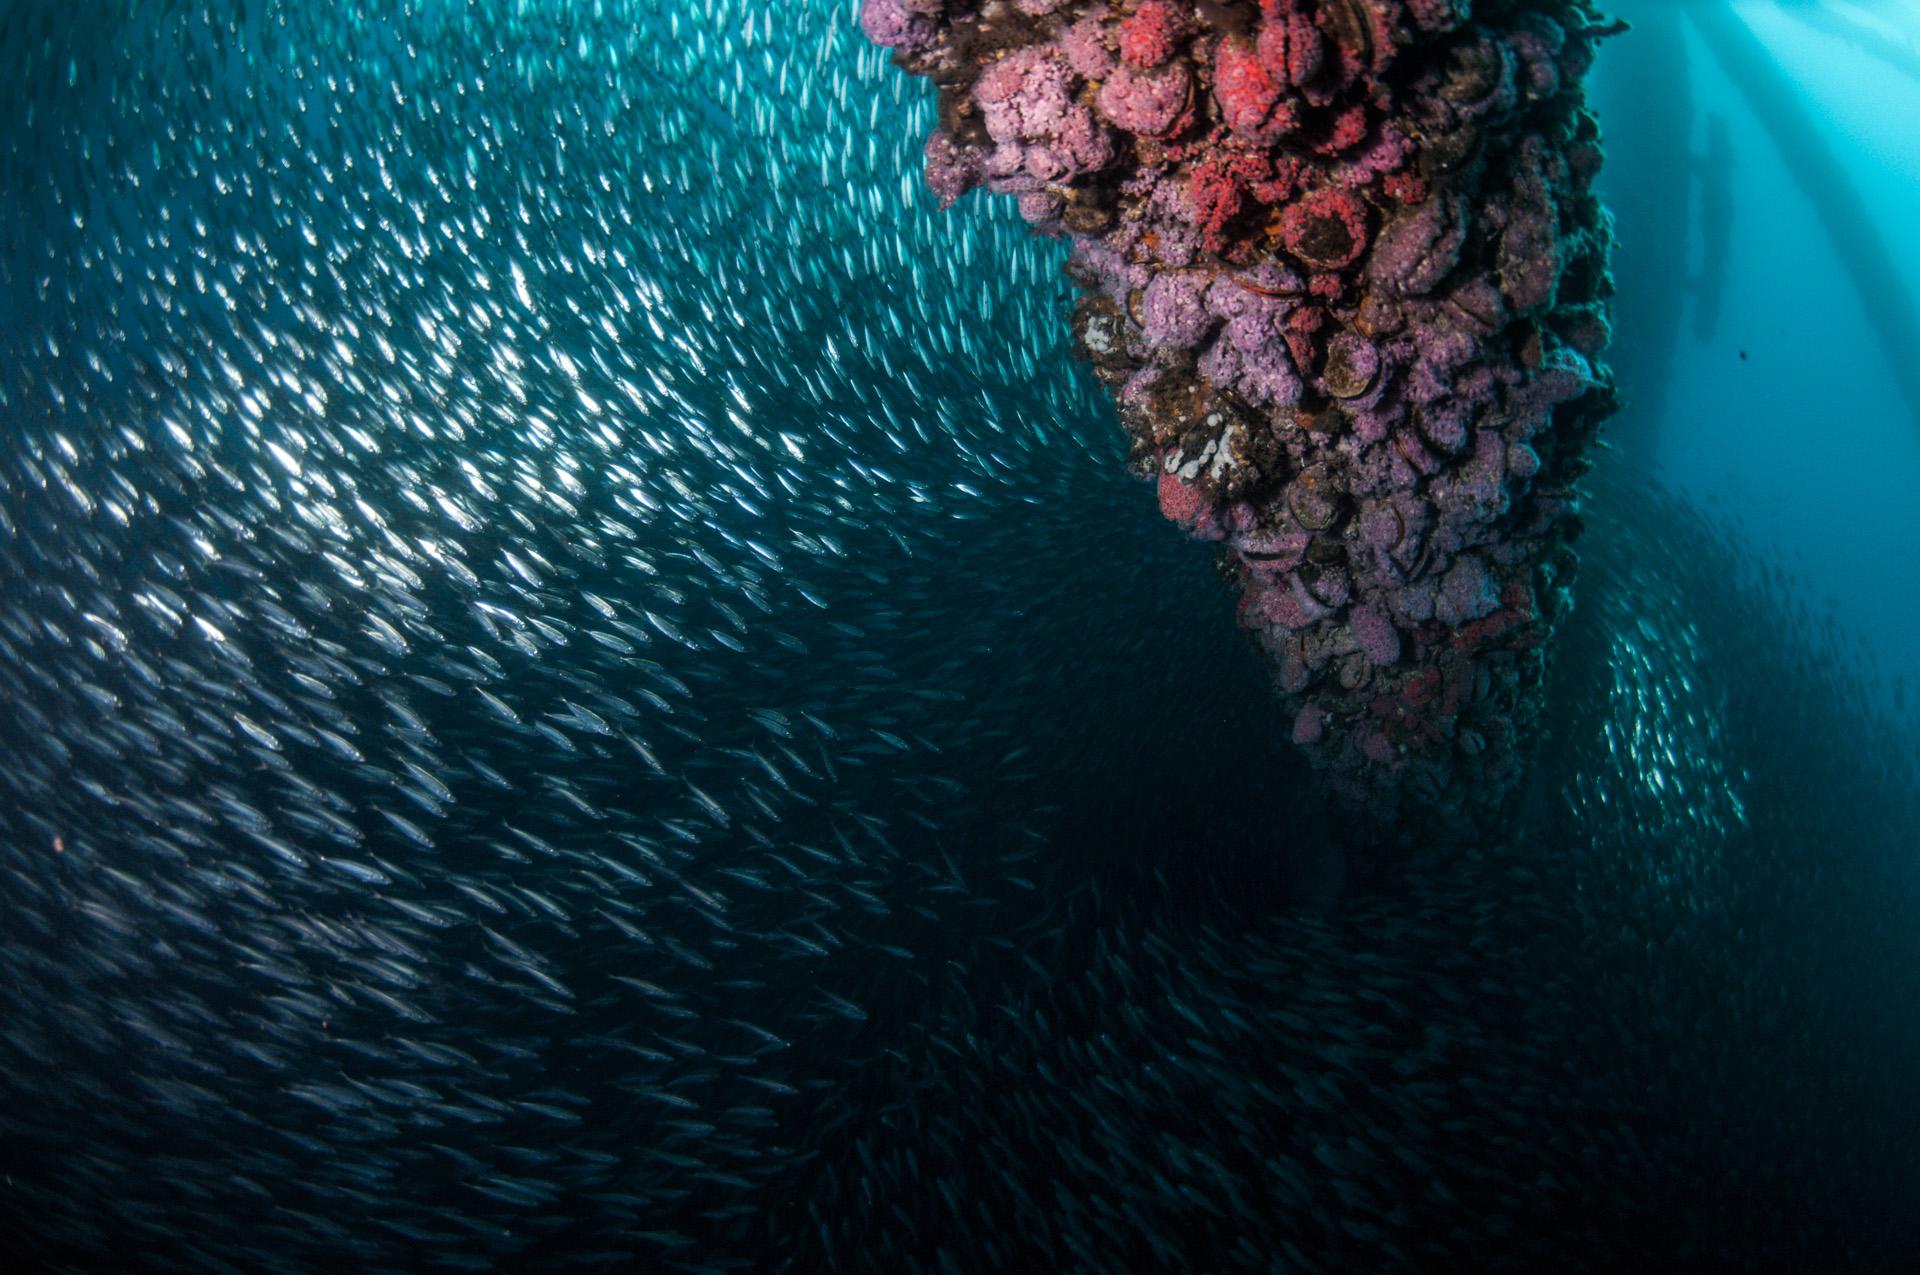 Jack mackerel swarm around Platform Eureka's invertebrate-covered legs. (Photo: Caine Delacy)